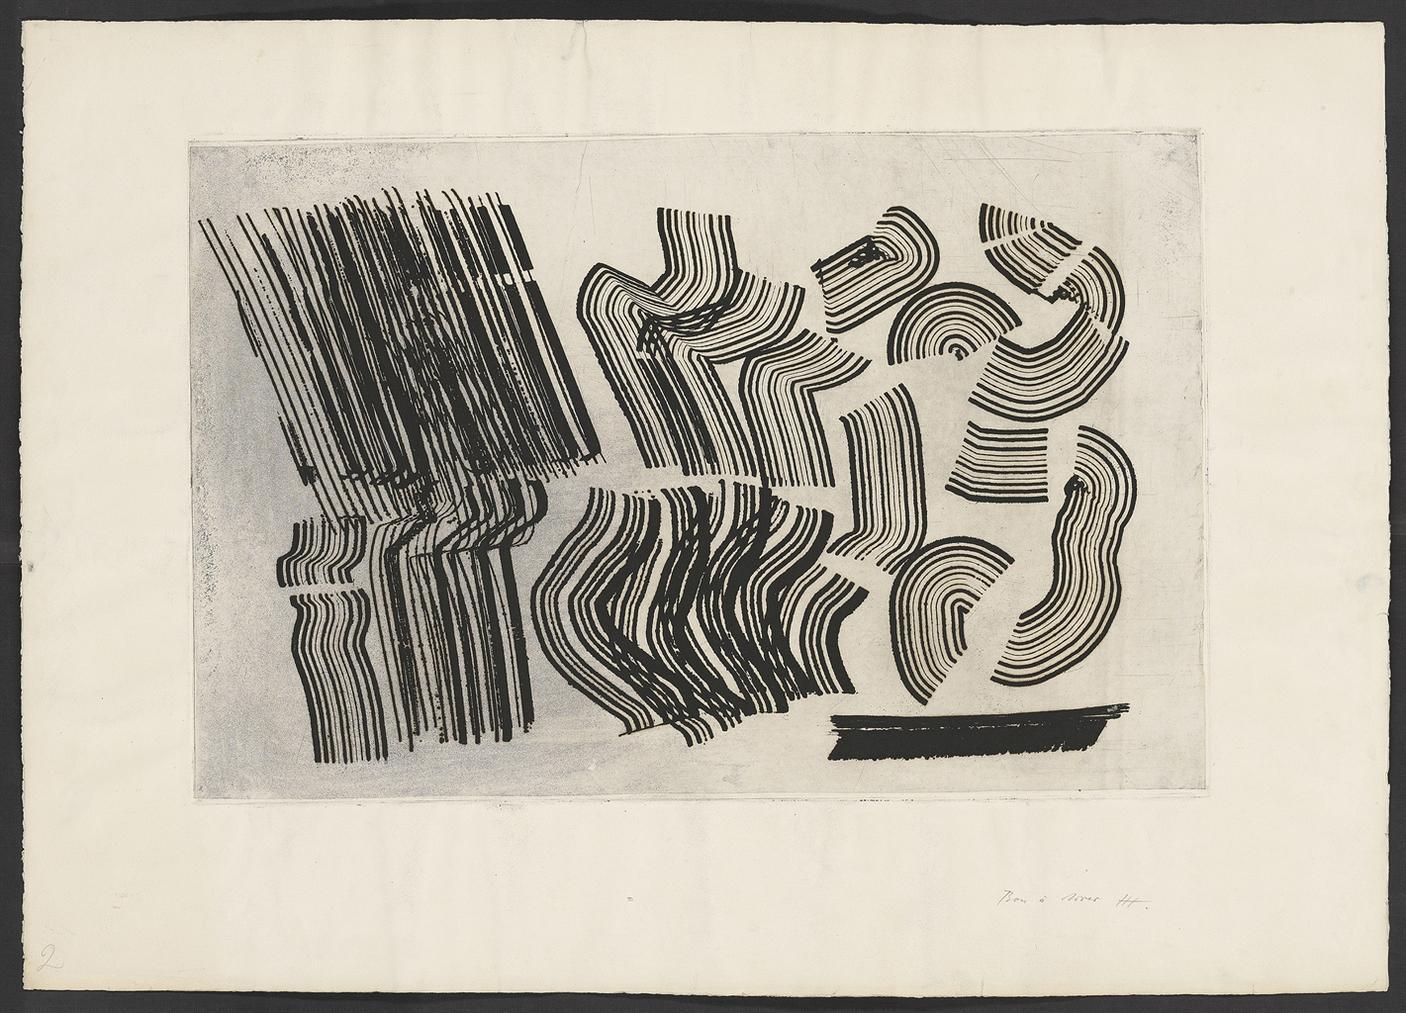 Hans Hartung-5 Aguafuertes-1971